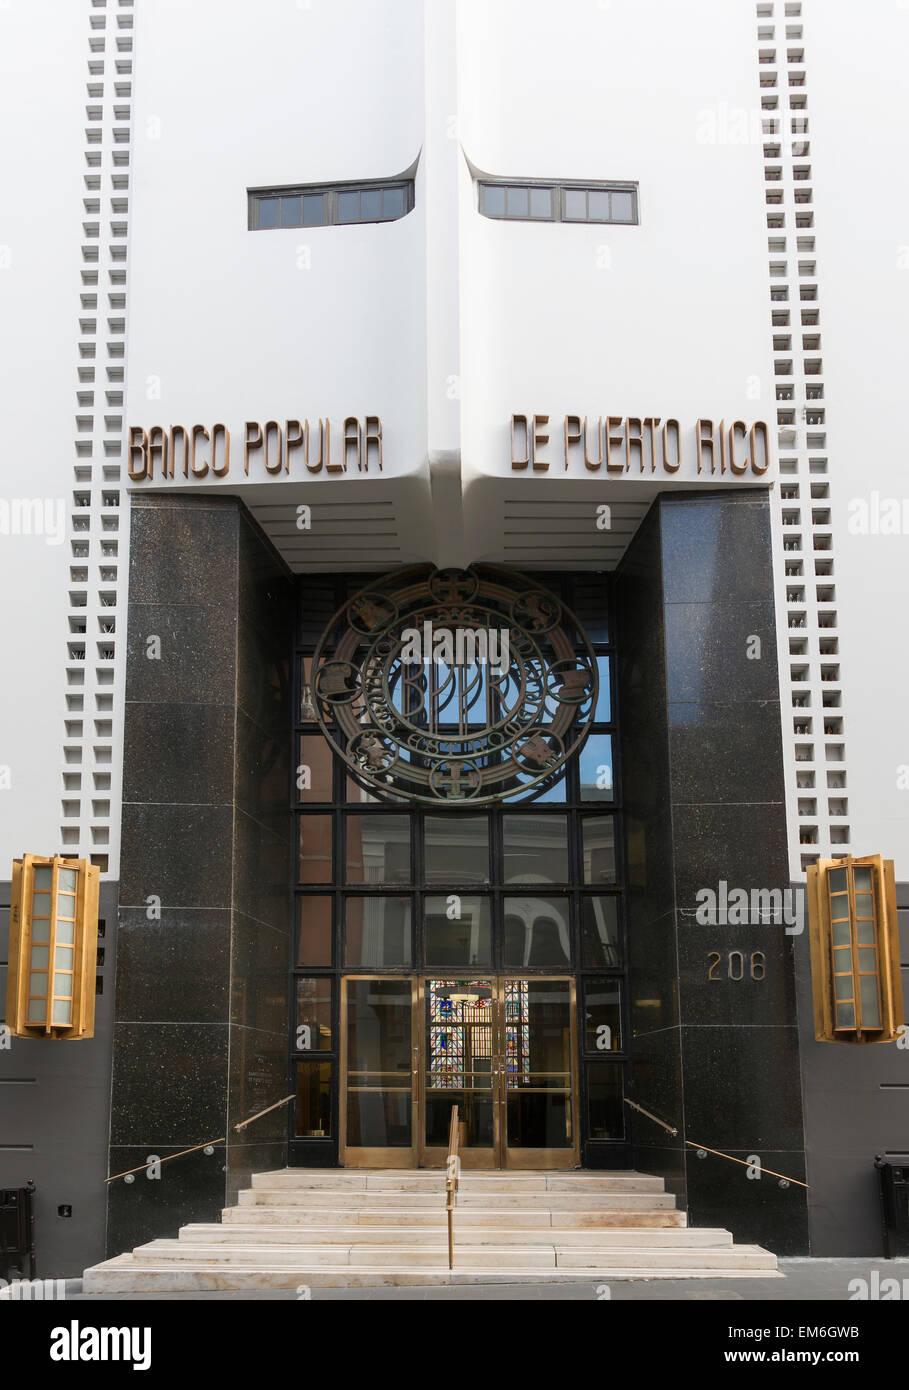 Entrance to headquarters Banco Popular of Puerto Rico. - Stock Image